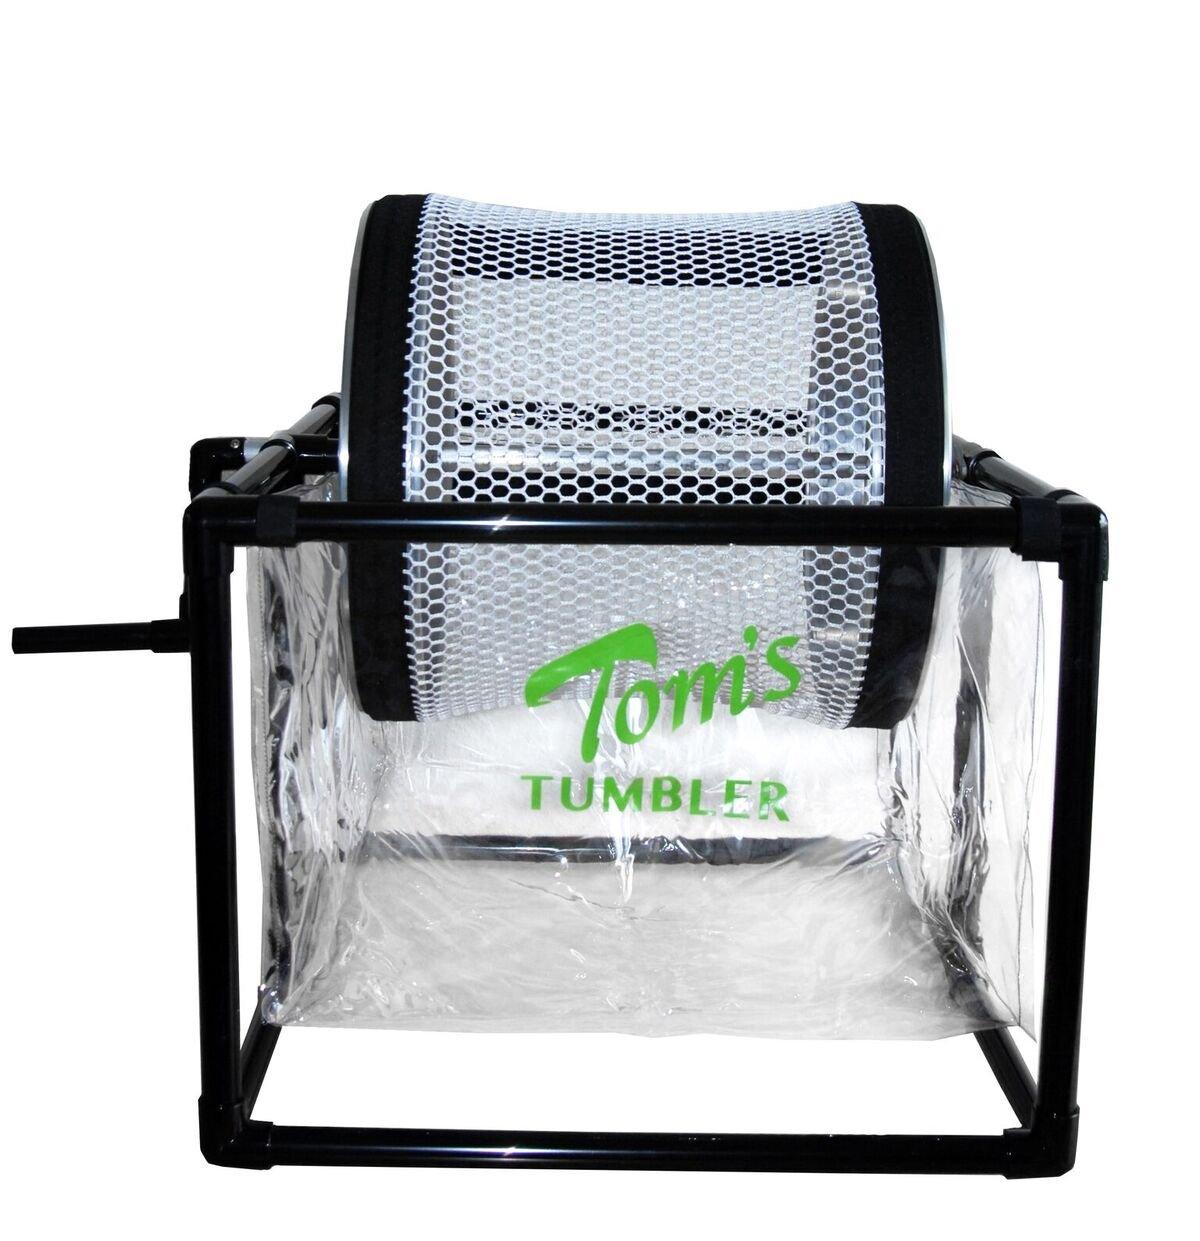 Tom's Tumbler TTT 1600 Hand Crank Table Top Dry Trimmer